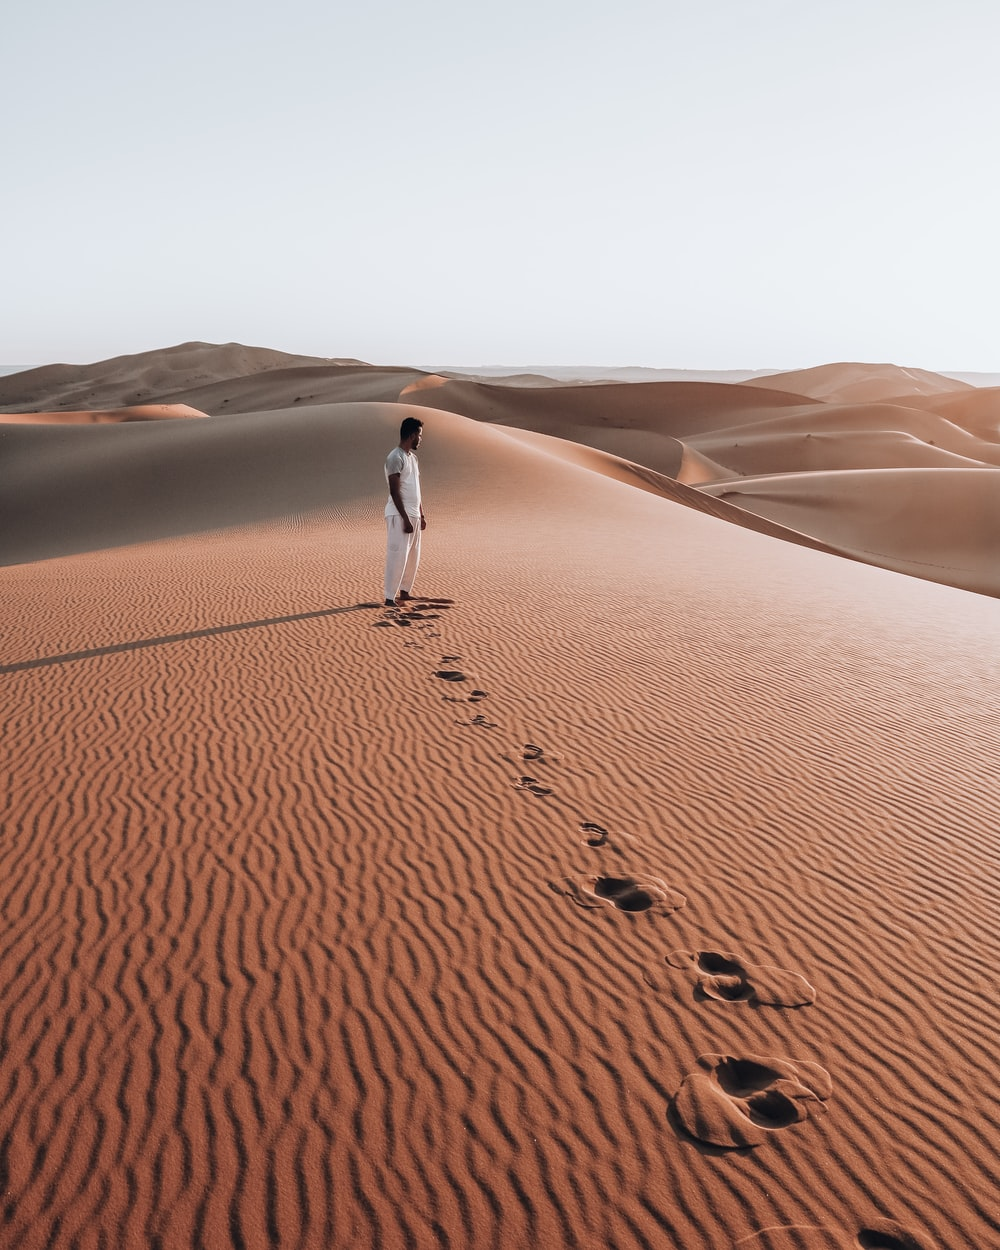 person in white shirt walking on desert during daytime